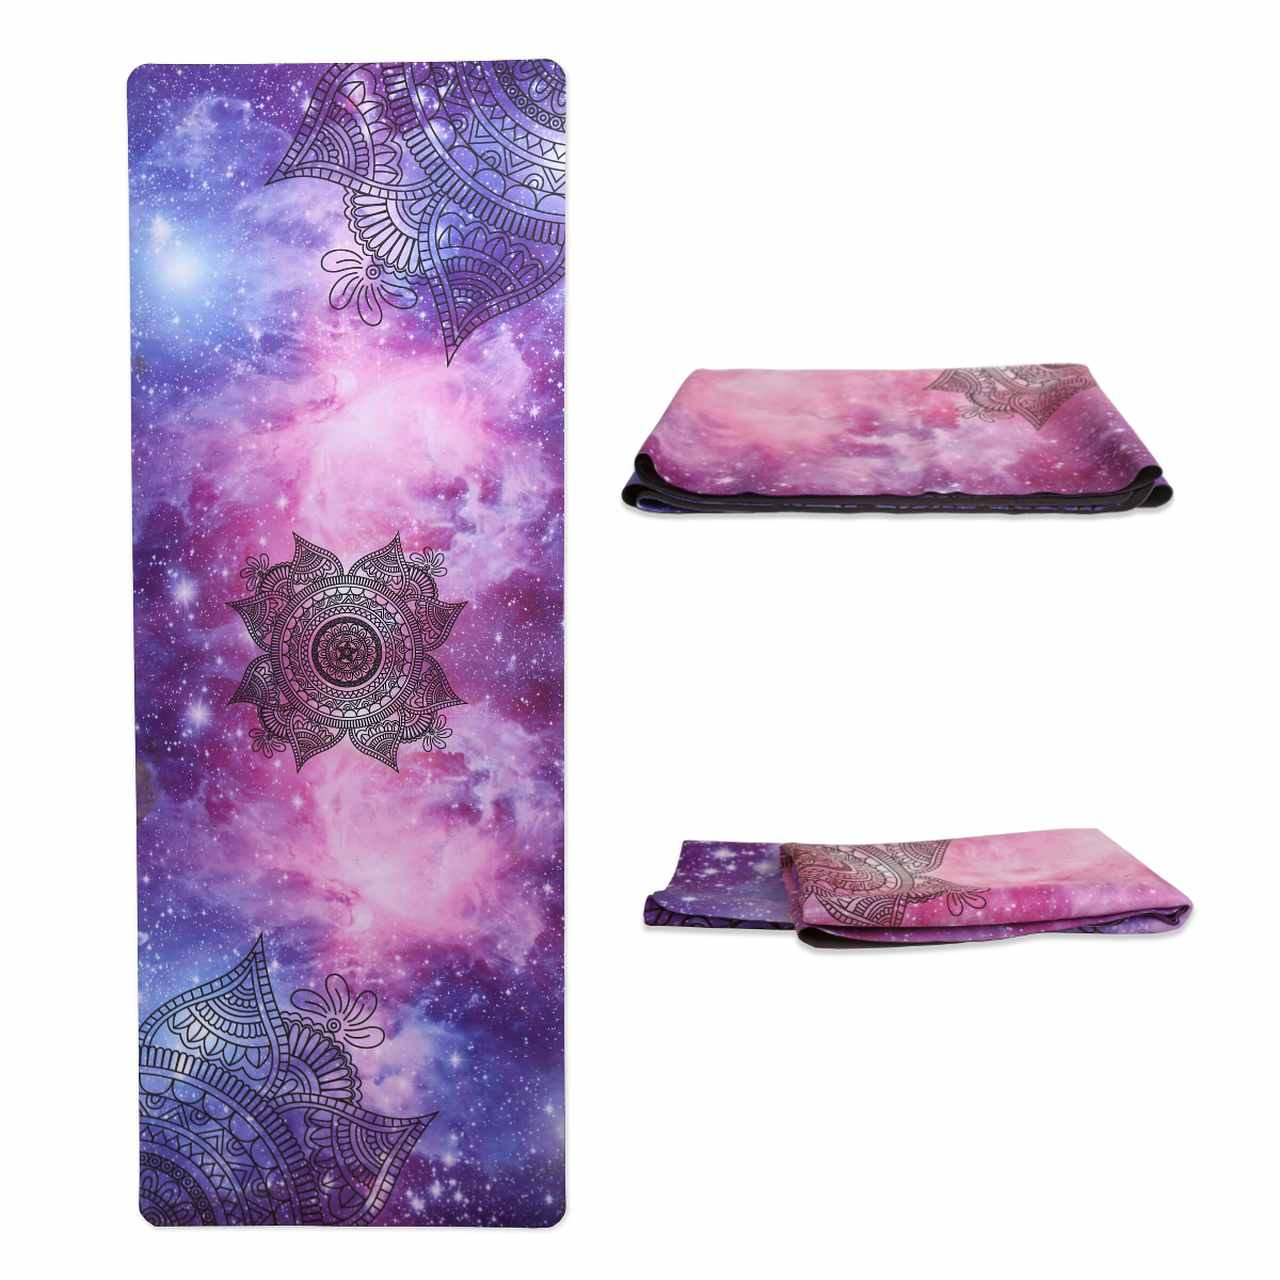 Tapete Yoga Dobrável Viagem Cosmos - Aveludado + Borracha Natural 1,5mm